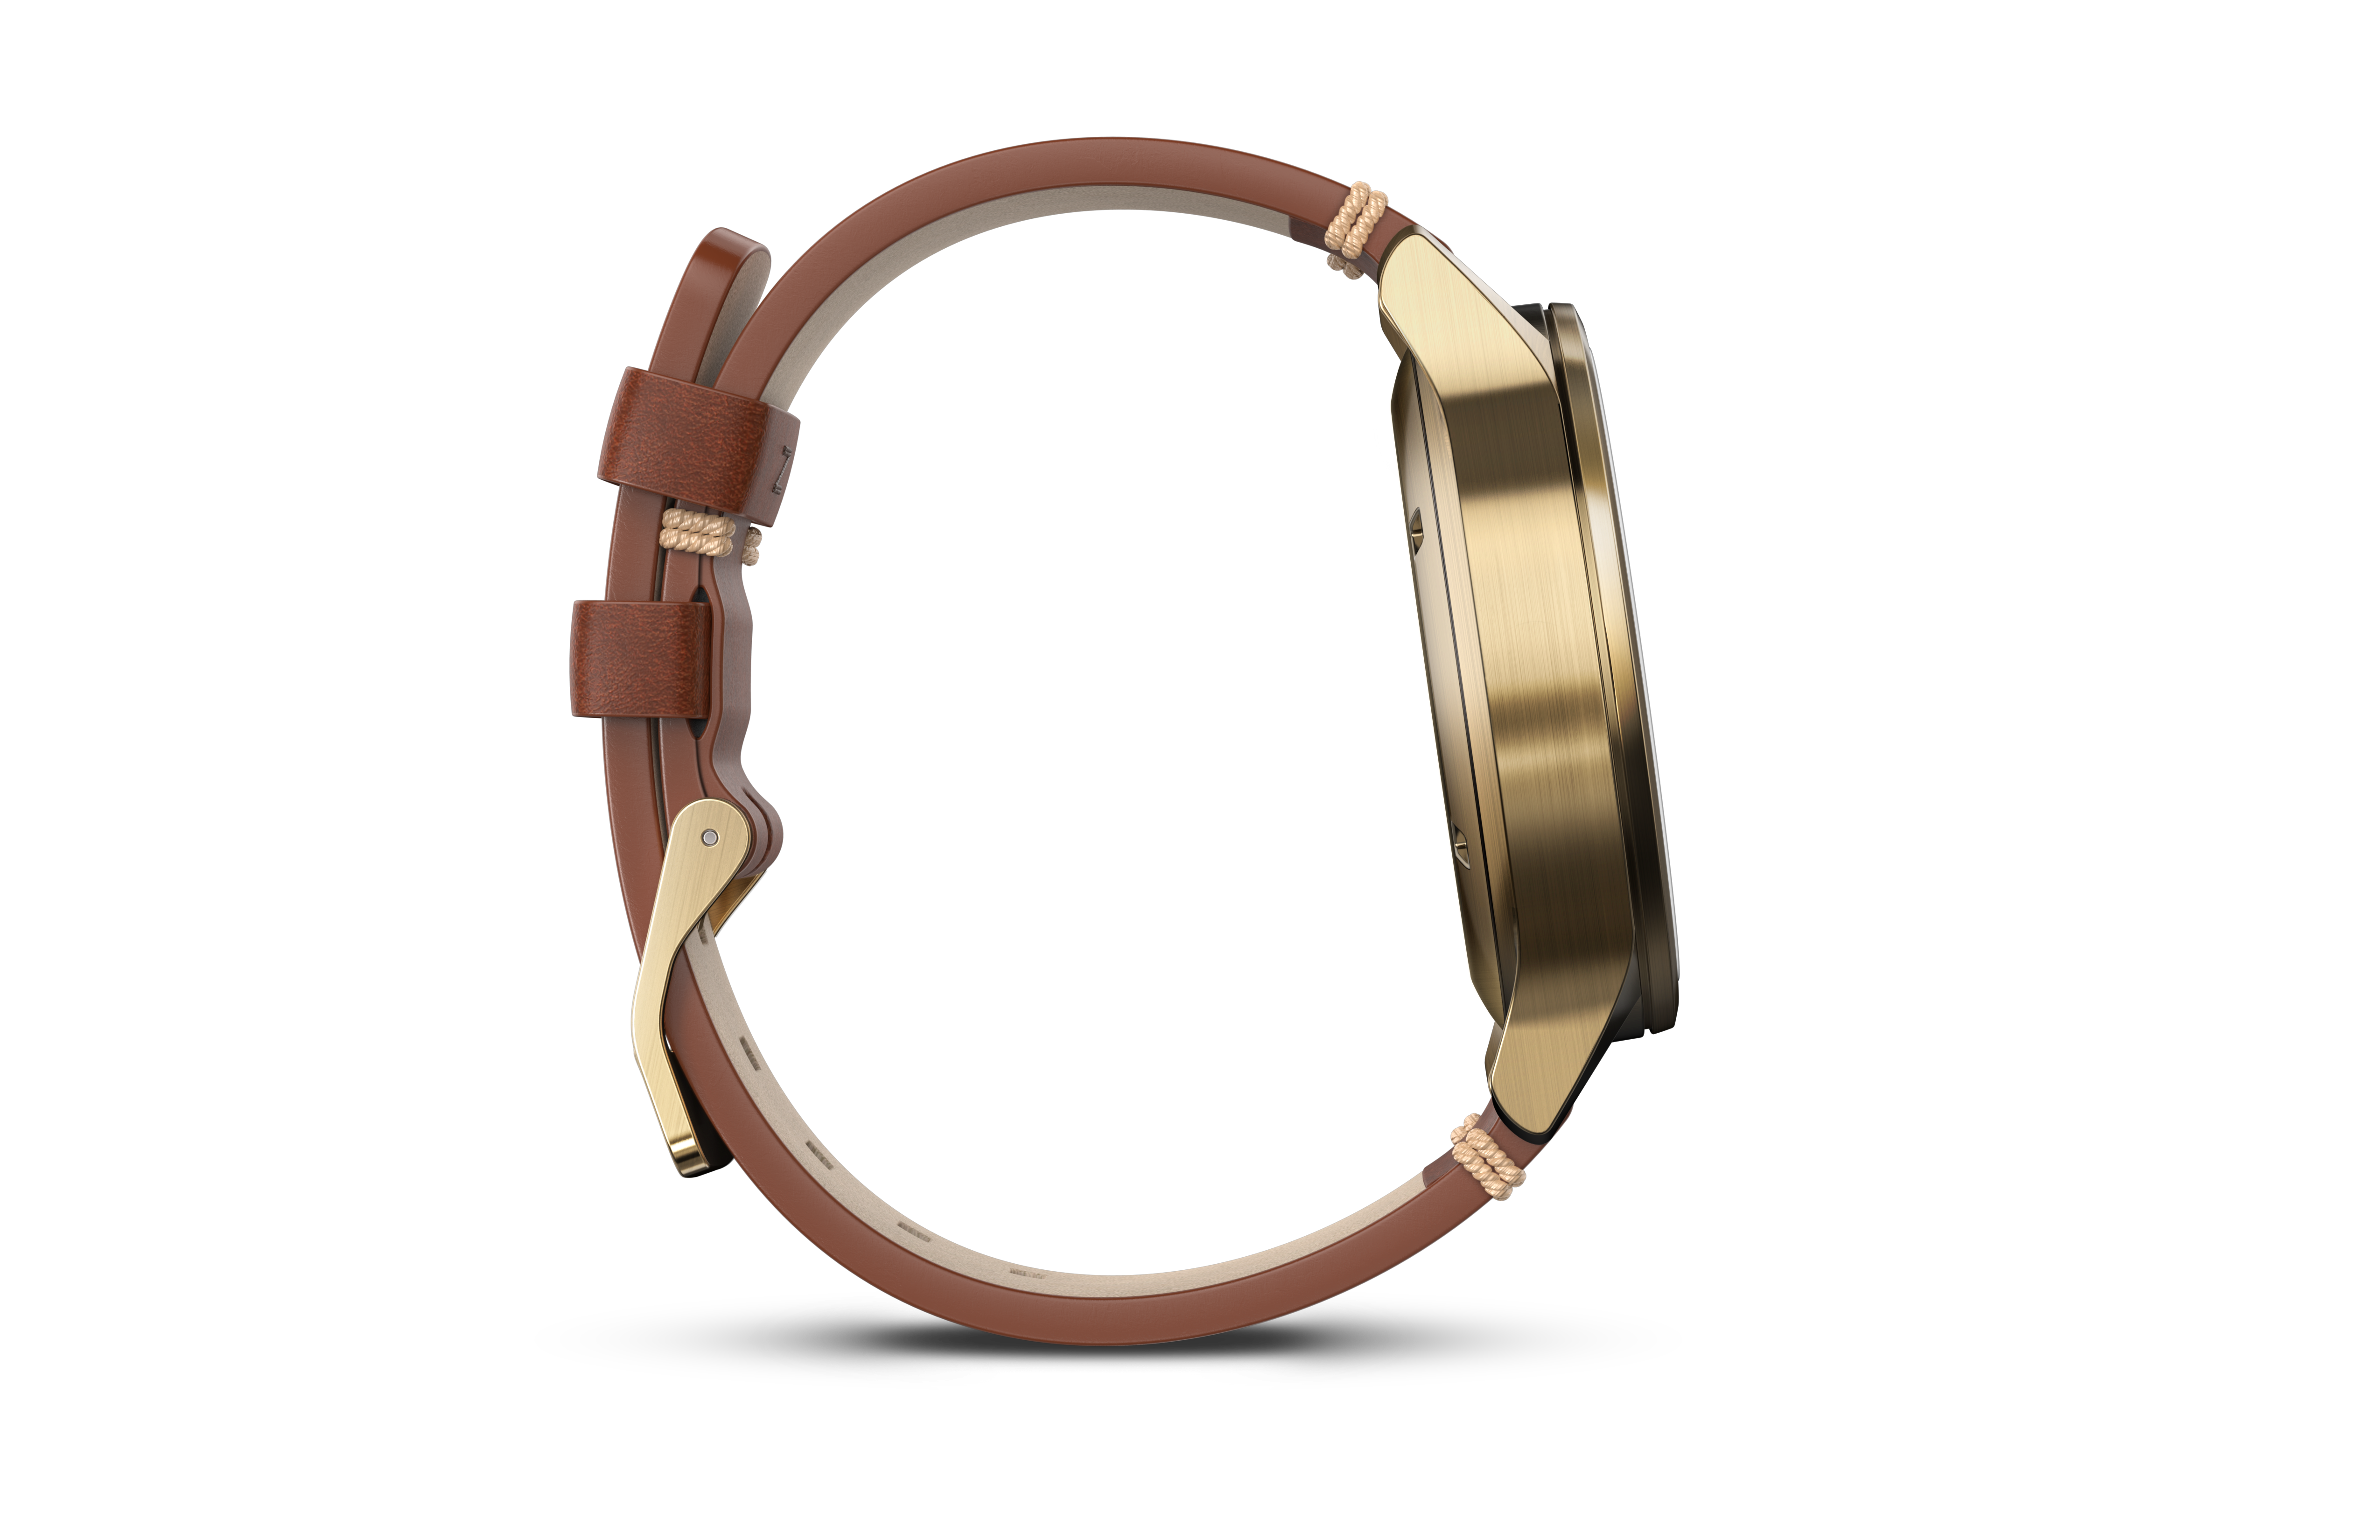 Garmin vivomove goud staal met lederen band